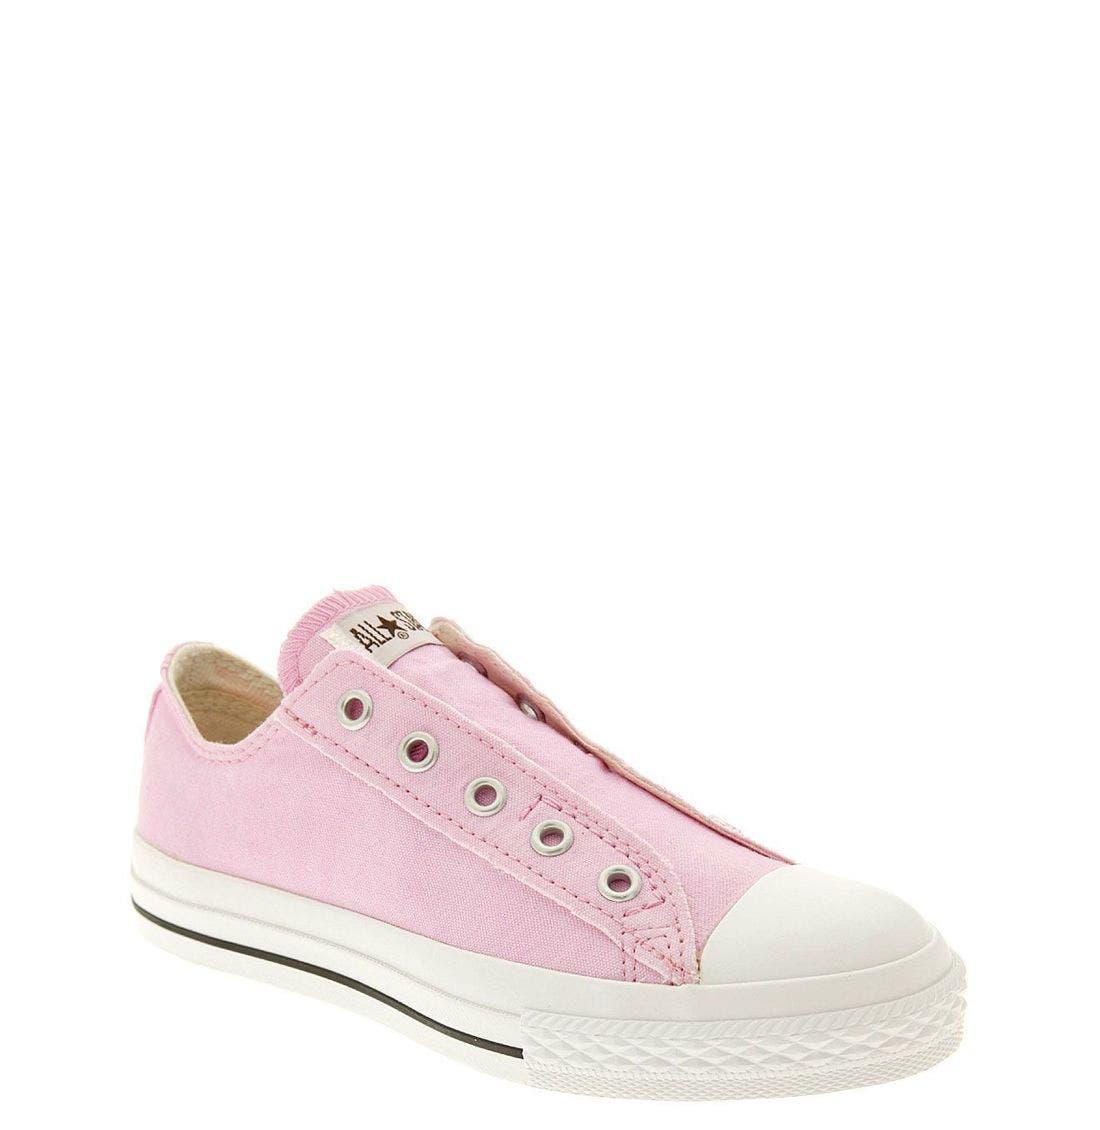 Main Image - Converse Chuck Taylor® Slip-On Sneaker (Big Kid)